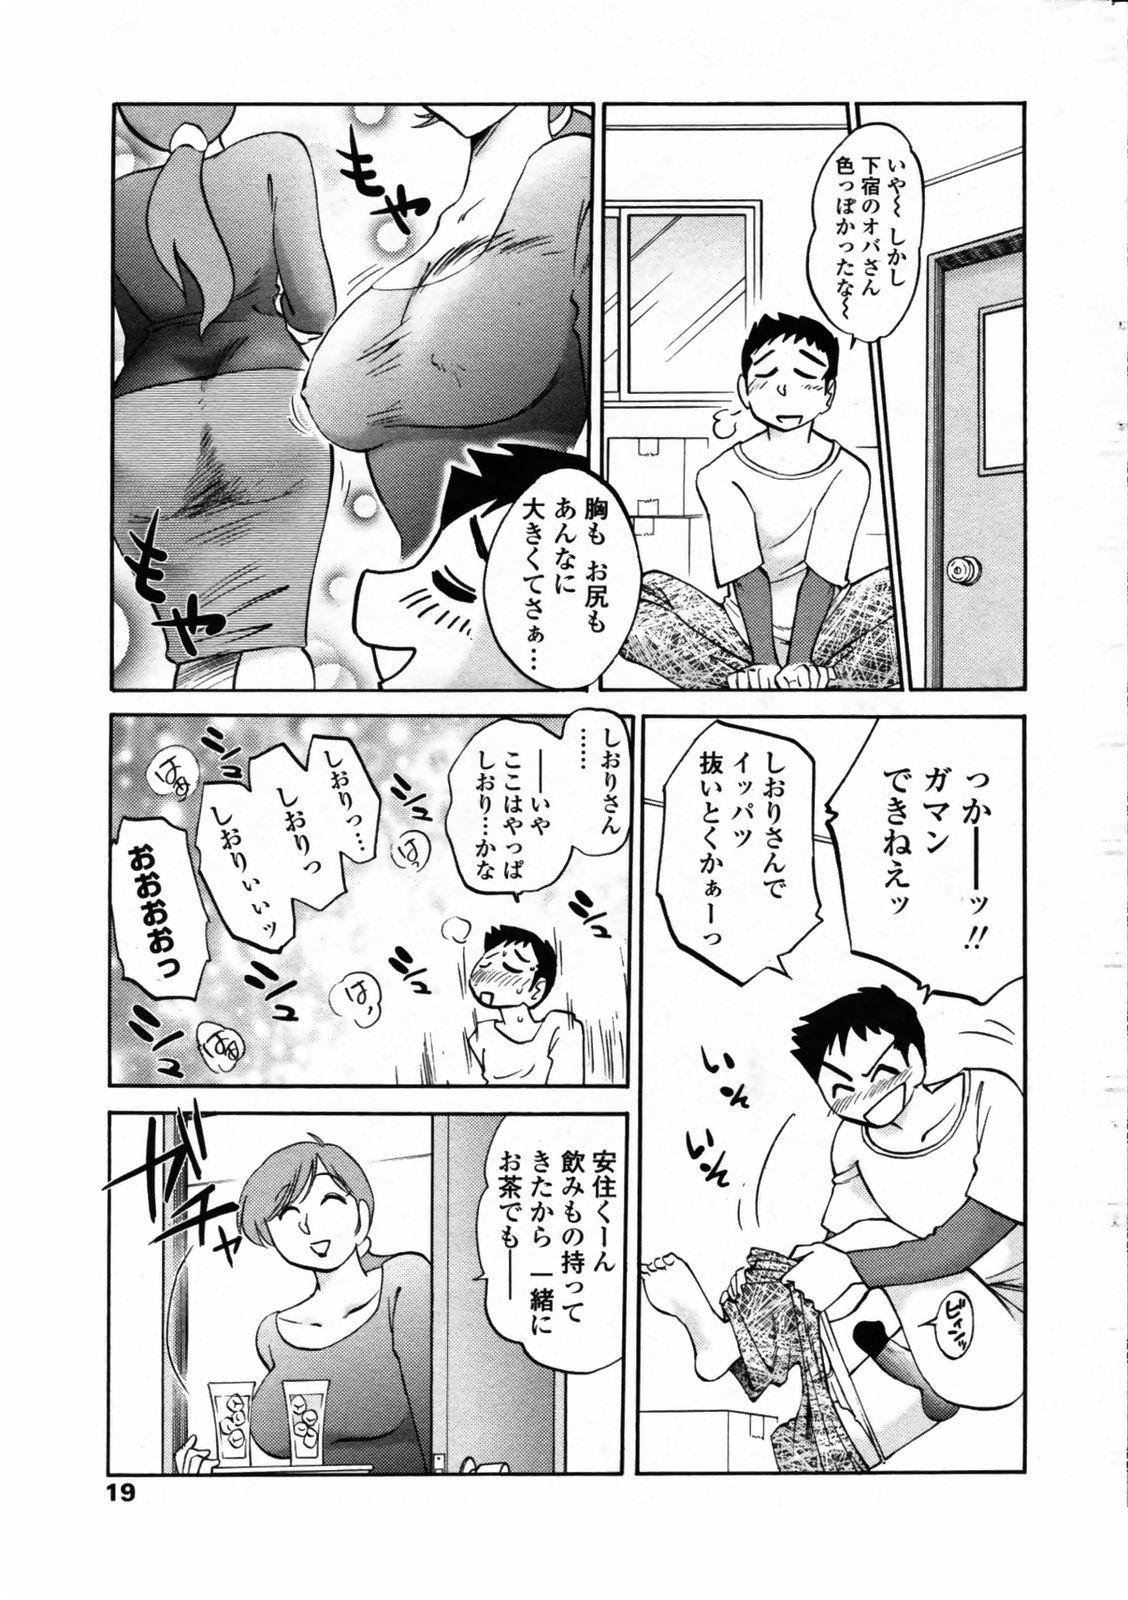 [Tsuyatsuya] Azumi-kun to Issho chapt.1-5 (Comic Penguin Club) 17